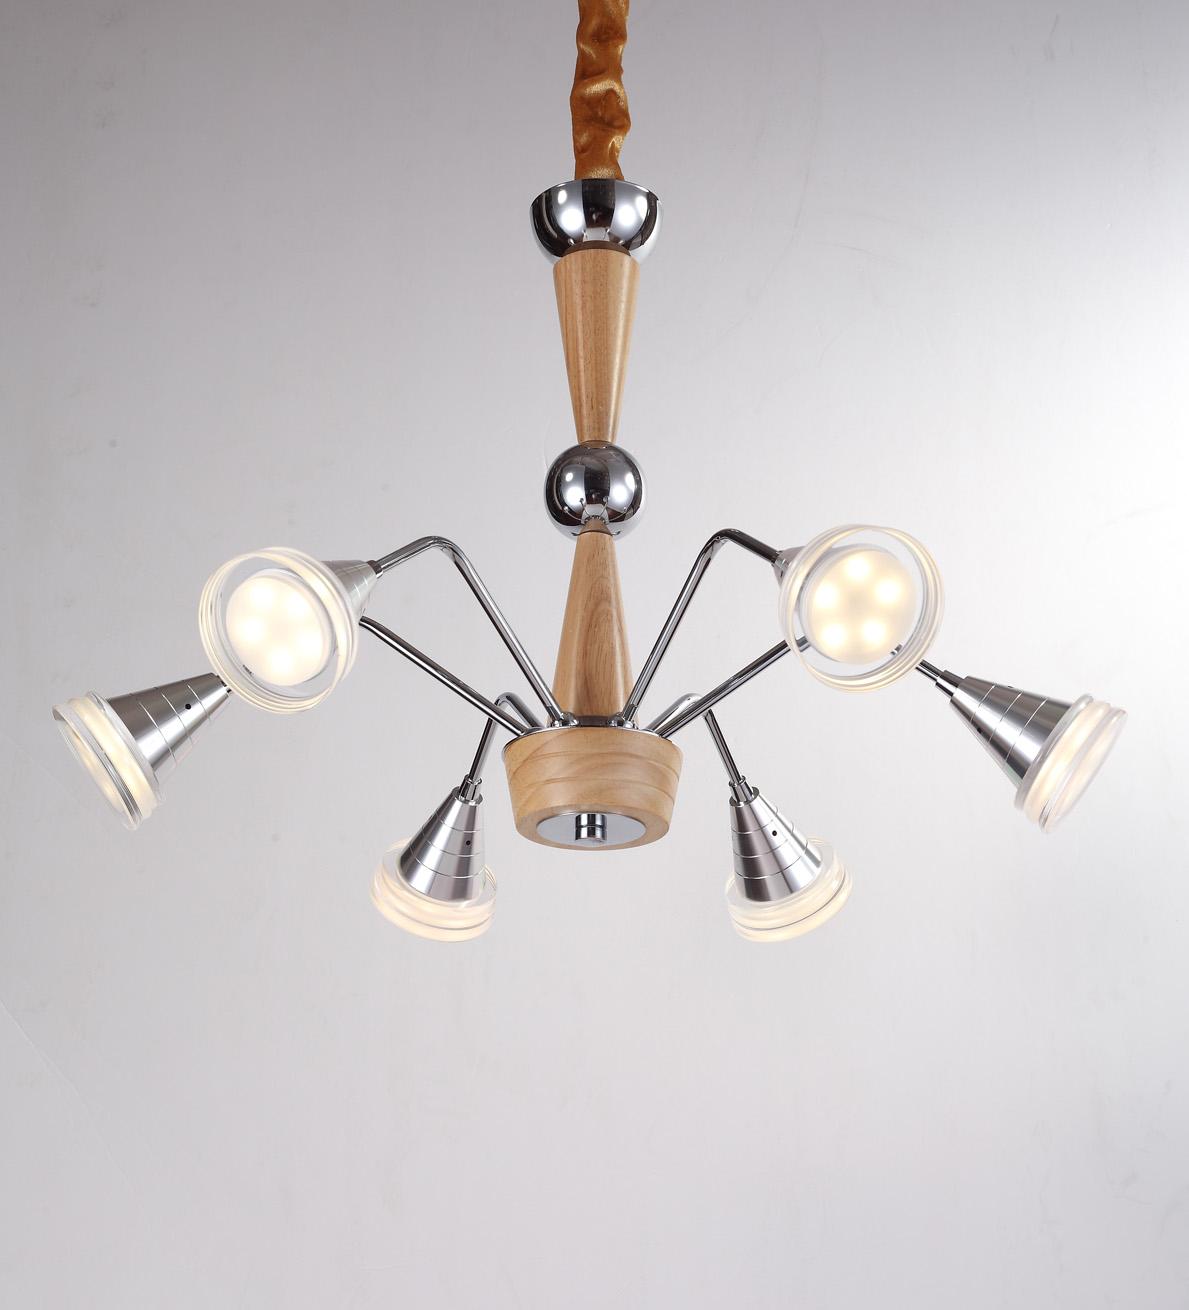 Люстра NaturaЛюстры подвесные<br>&amp;lt;div&amp;gt;Вид цоколя: LED&amp;lt;/div&amp;gt;&amp;lt;div&amp;gt;Мощность: &amp;amp;nbsp;5W&amp;amp;nbsp;&amp;lt;/div&amp;gt;&amp;lt;div&amp;gt;Количество ламп: 6&amp;lt;/div&amp;gt;<br><br>Material: Дерево<br>Height см: 79<br>Diameter см: 60